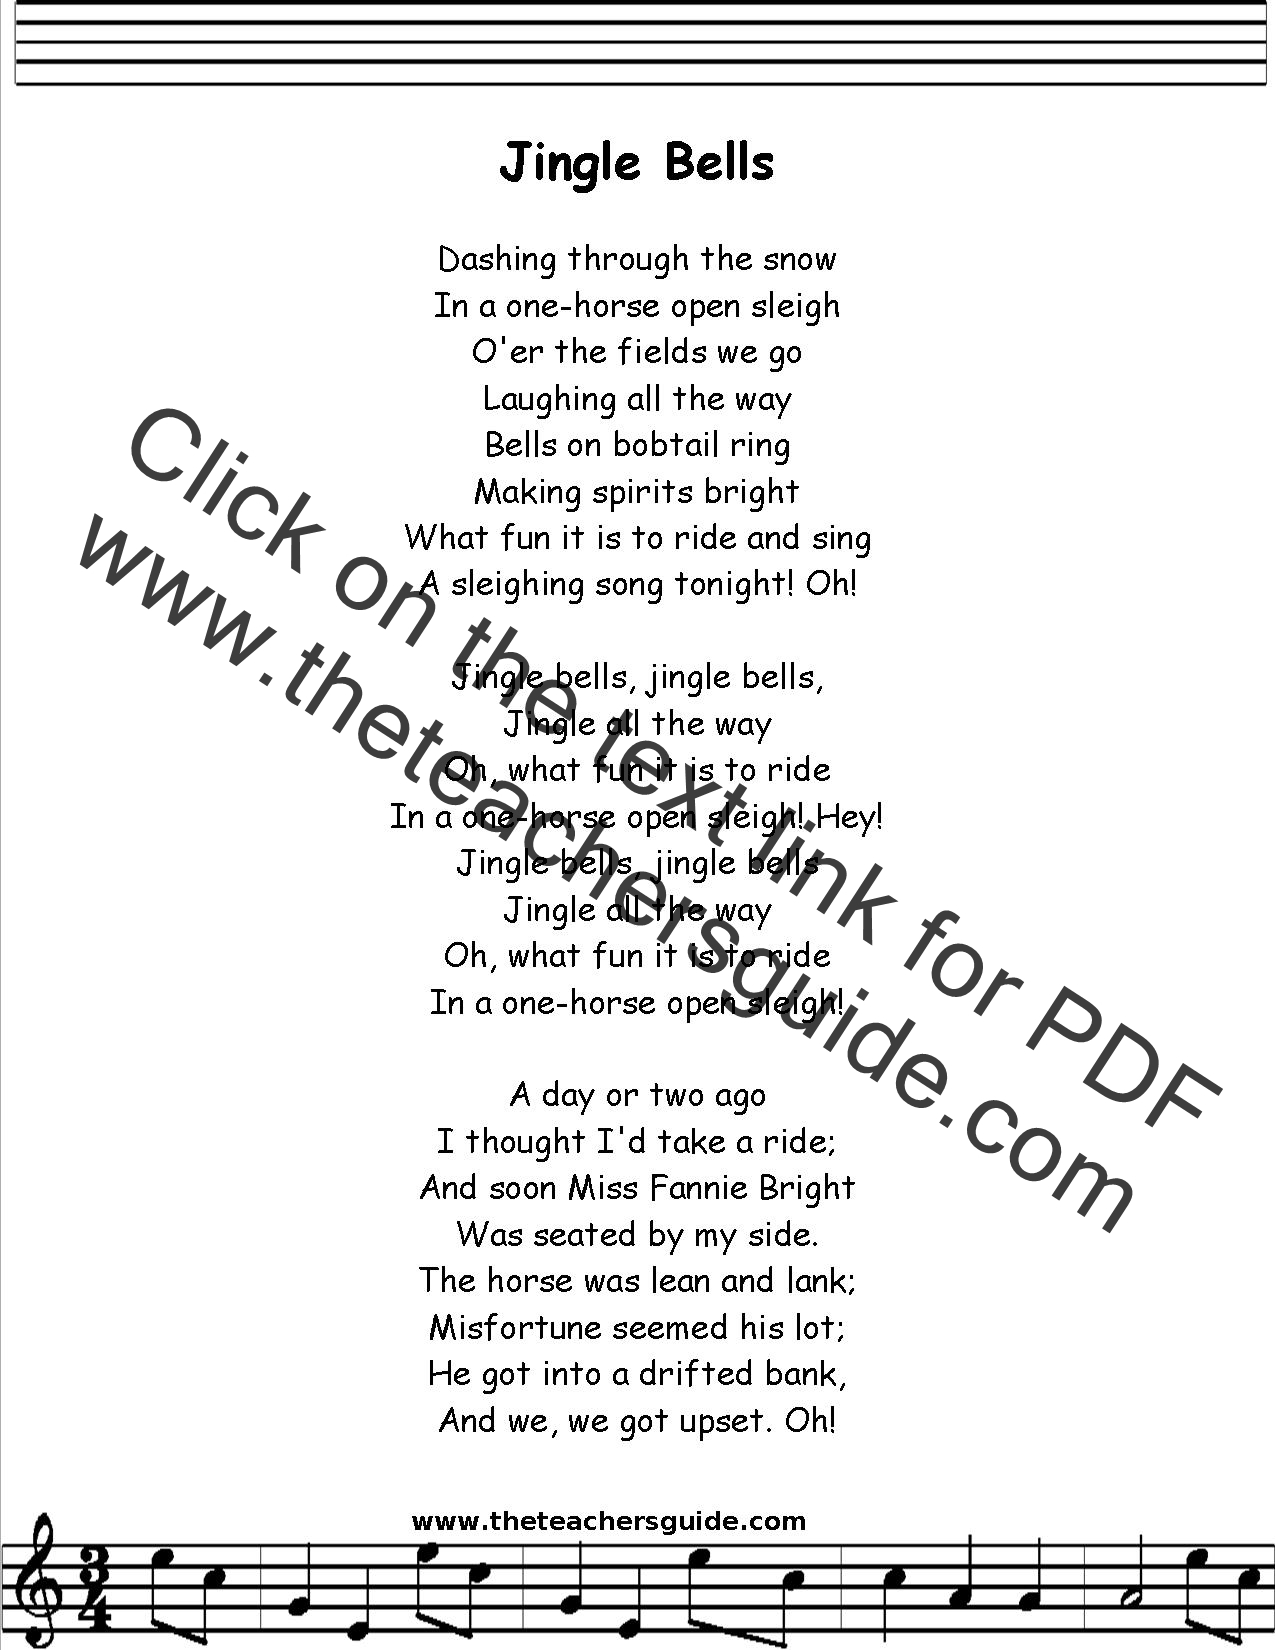 Jingle Bells Lyrics Printout Midi And Video